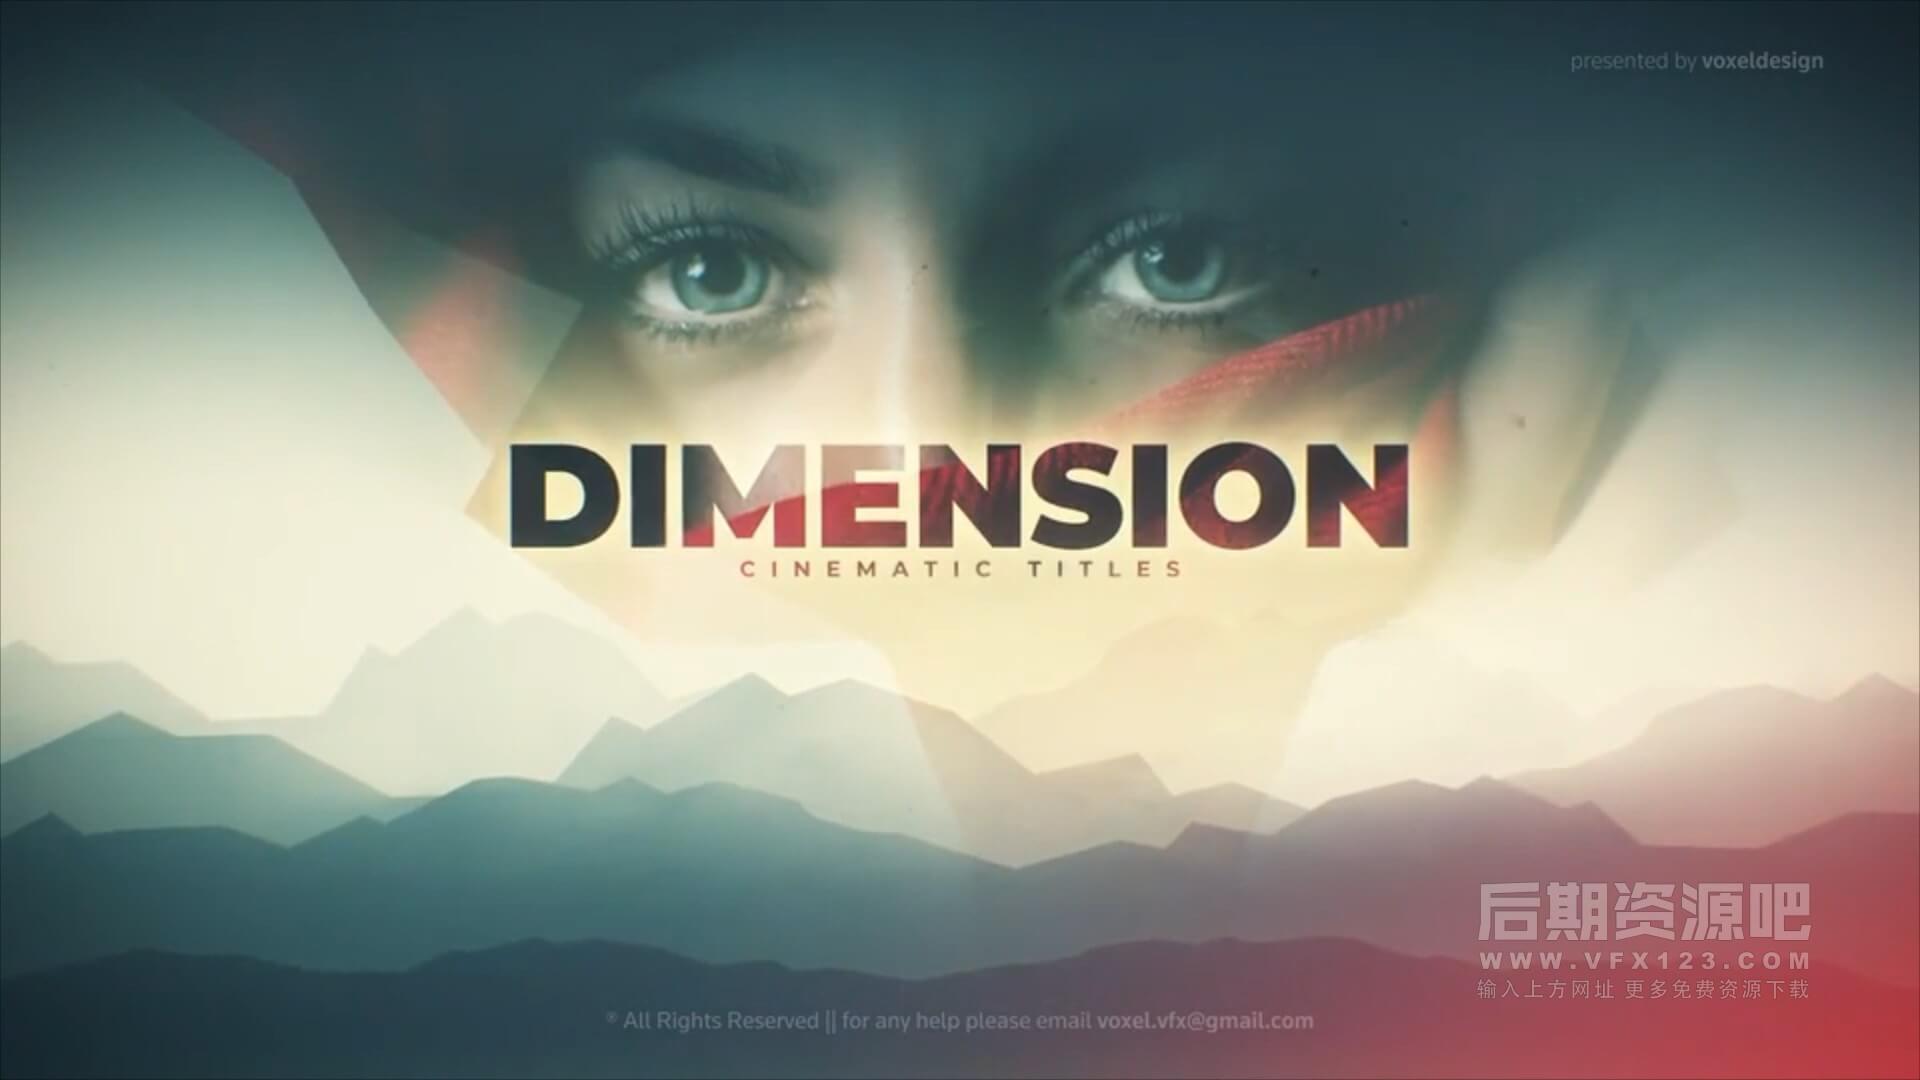 AE模板 深沉史诗电影预告片片头 Dimension Cinematic title